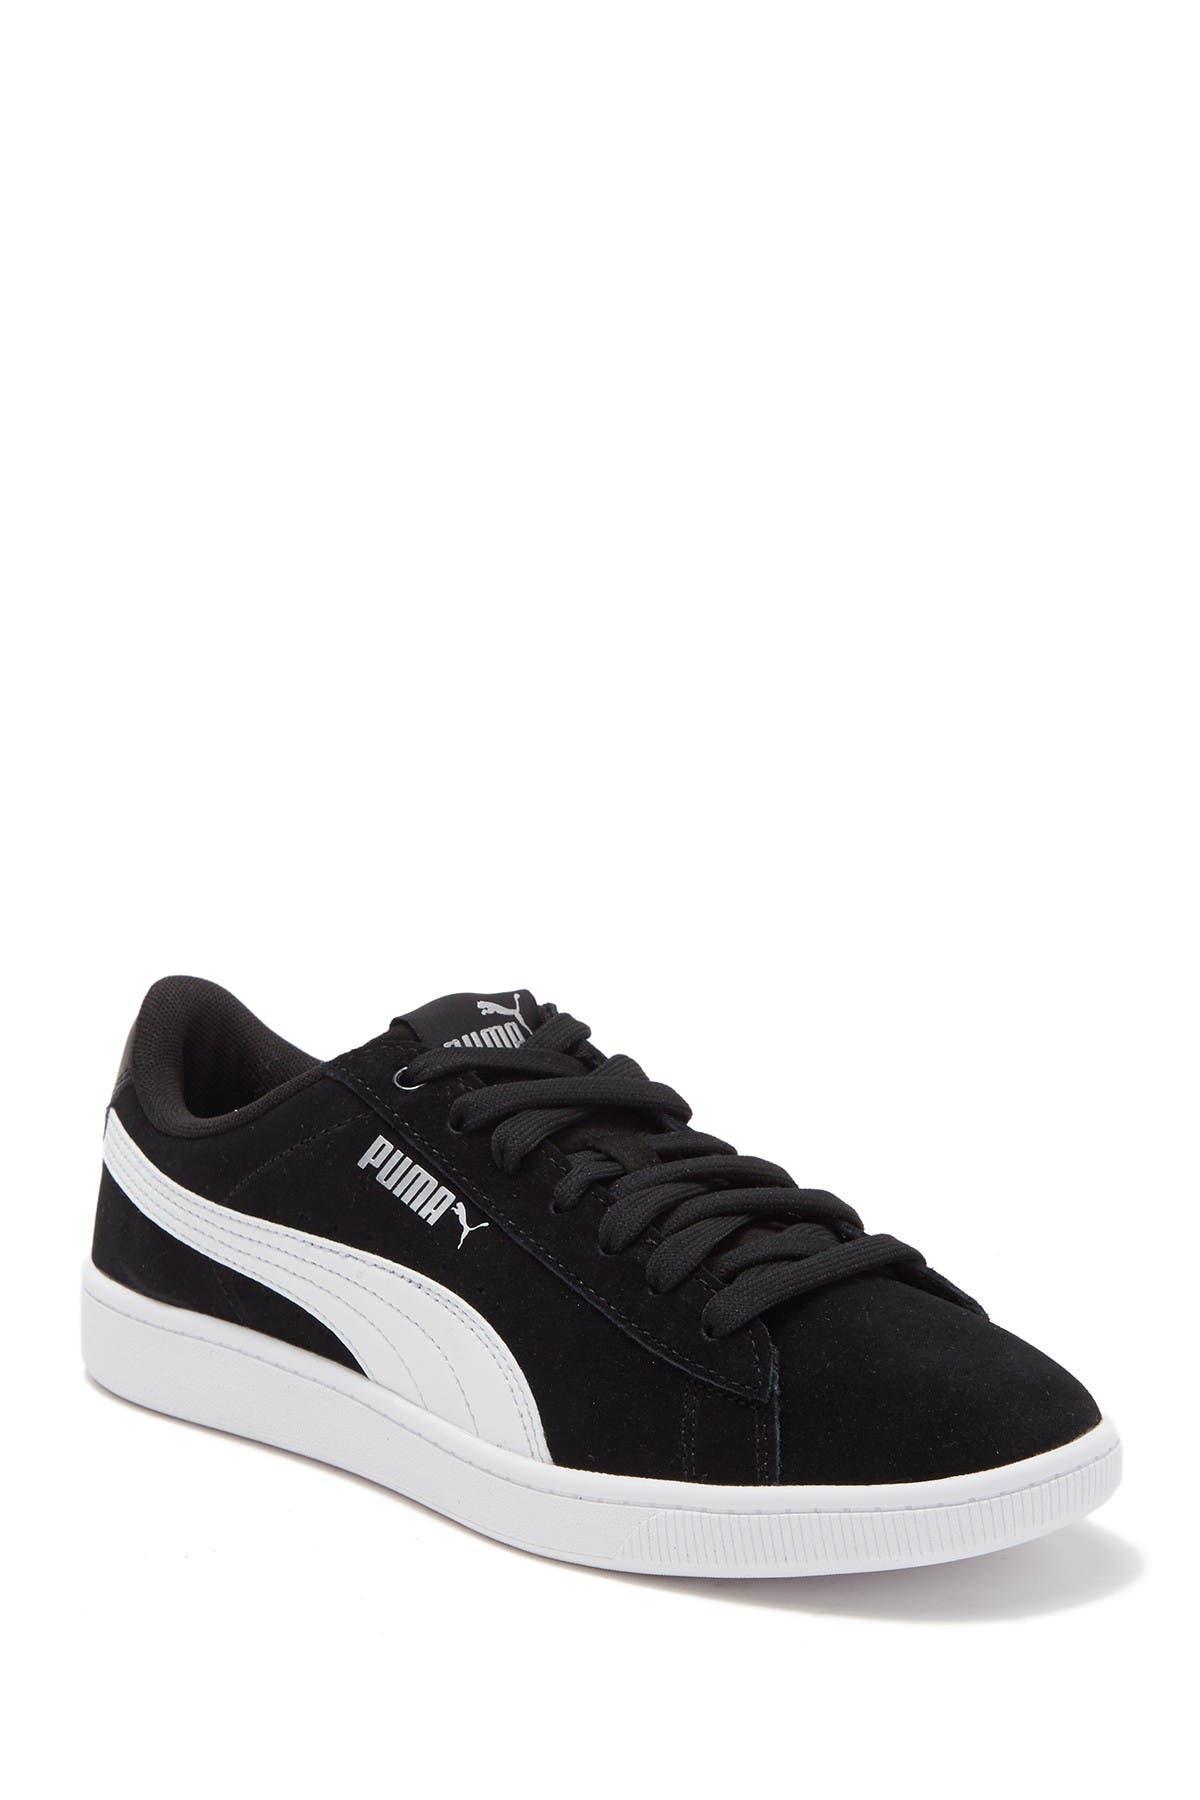 Image of PUMA Vikky V2 Suede Sneaker